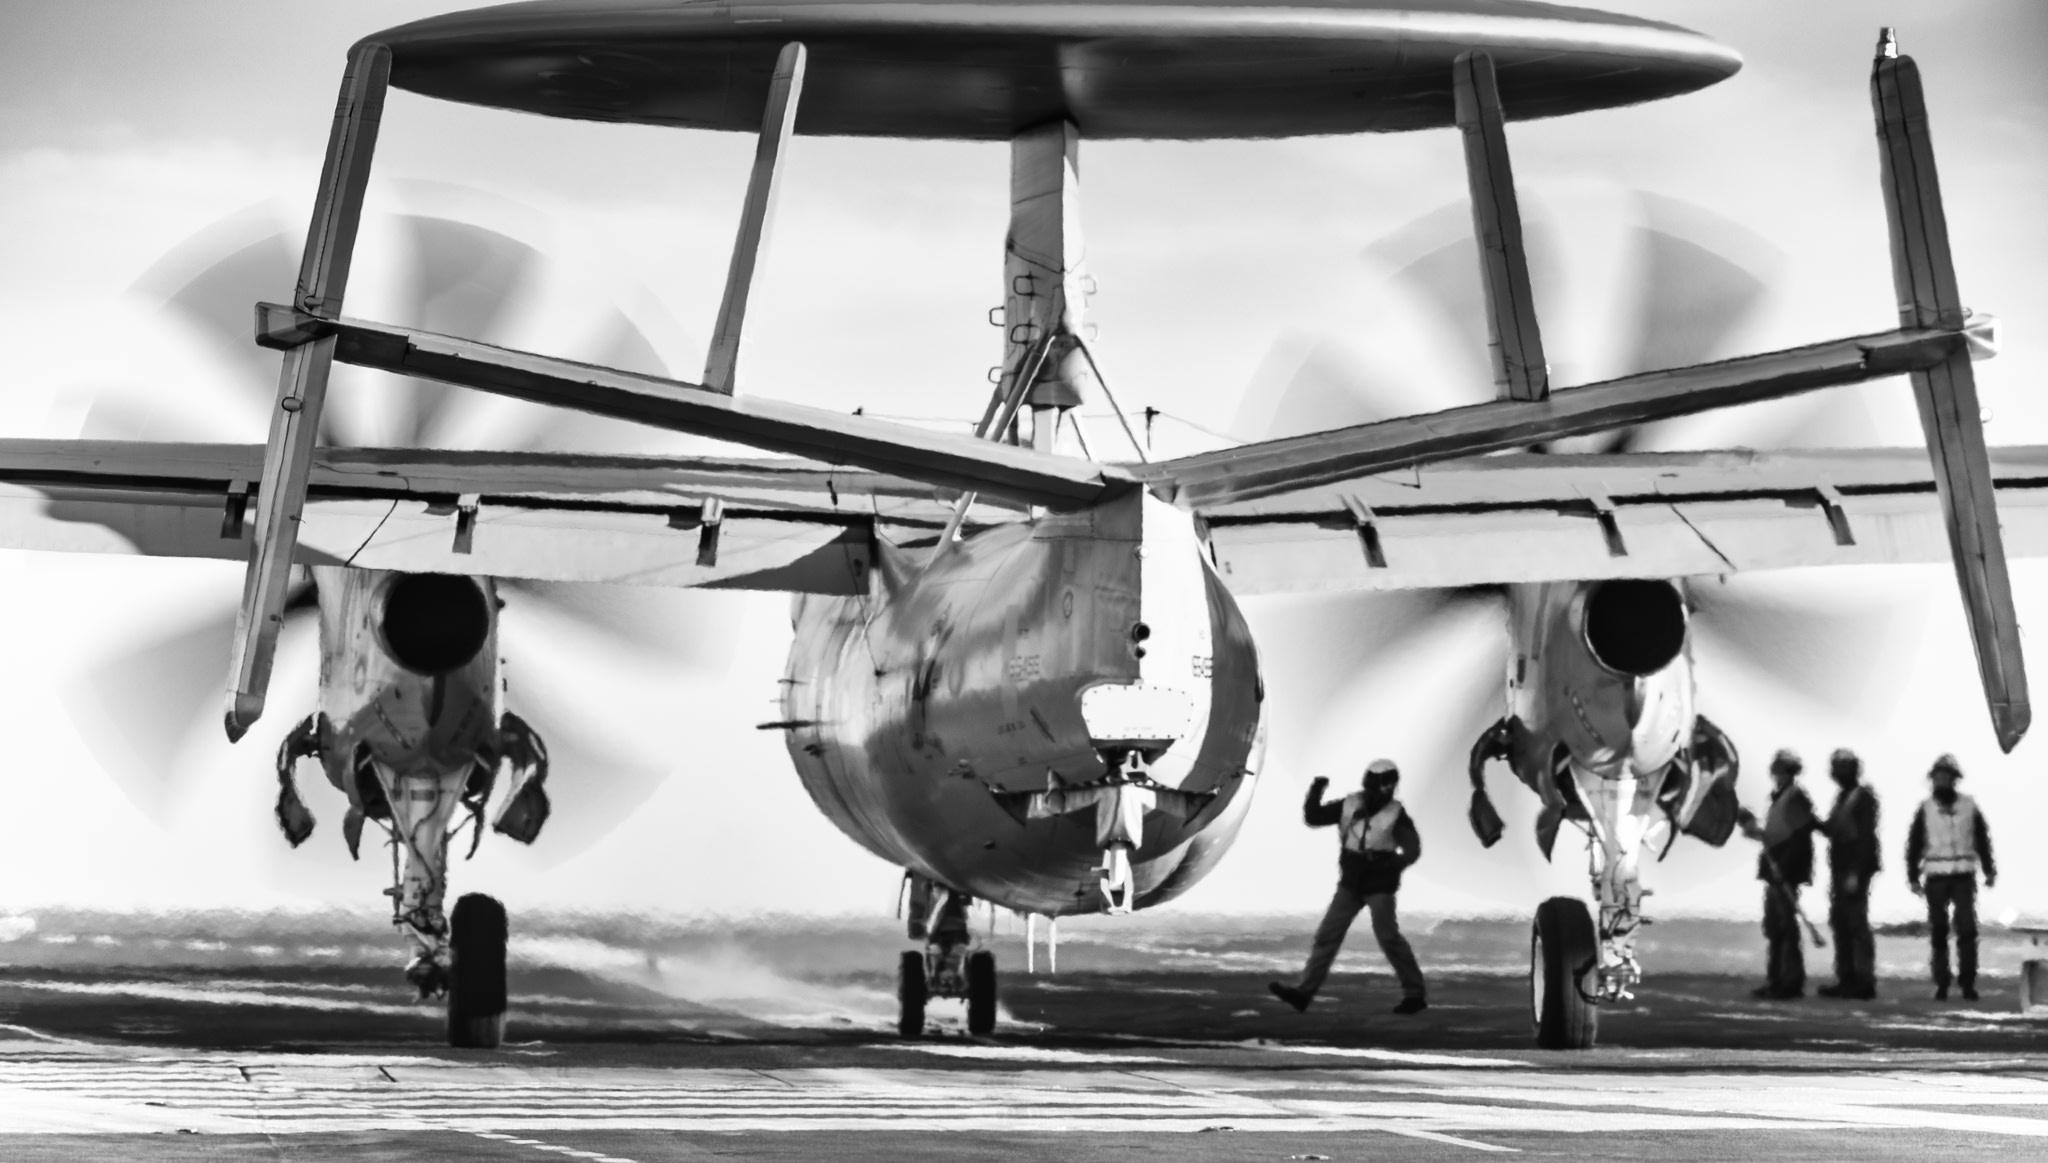 Photographie avion Marine Nationale DSC6156